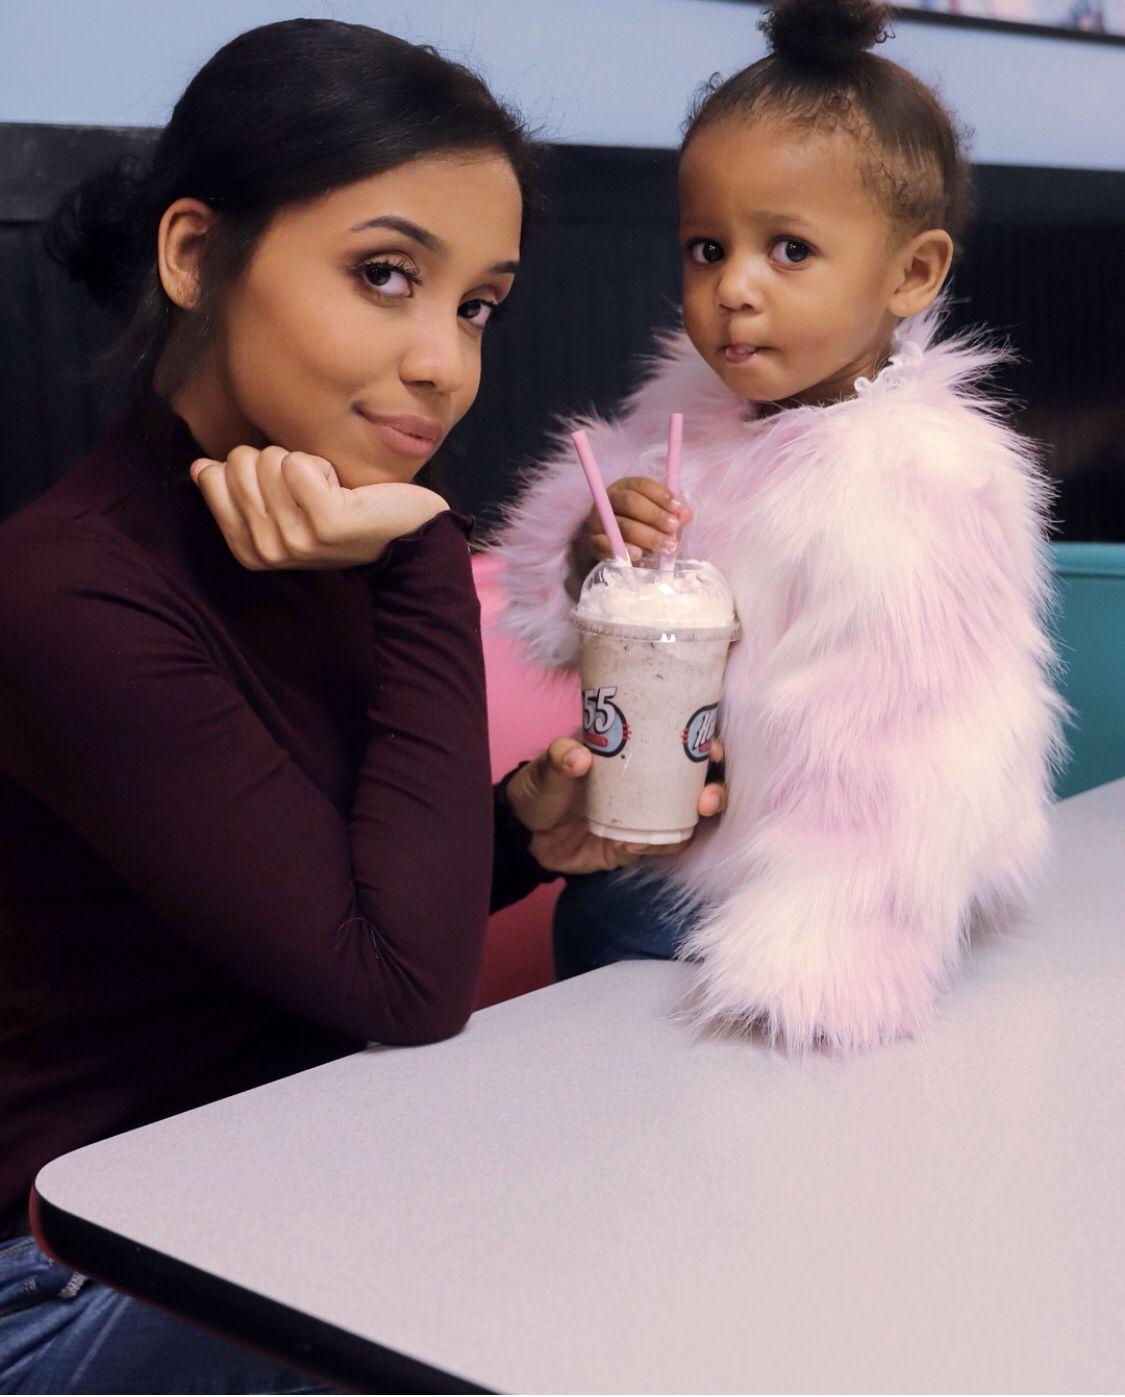 Armaniasia❤ lil baby cute baby girl baby love cute babies